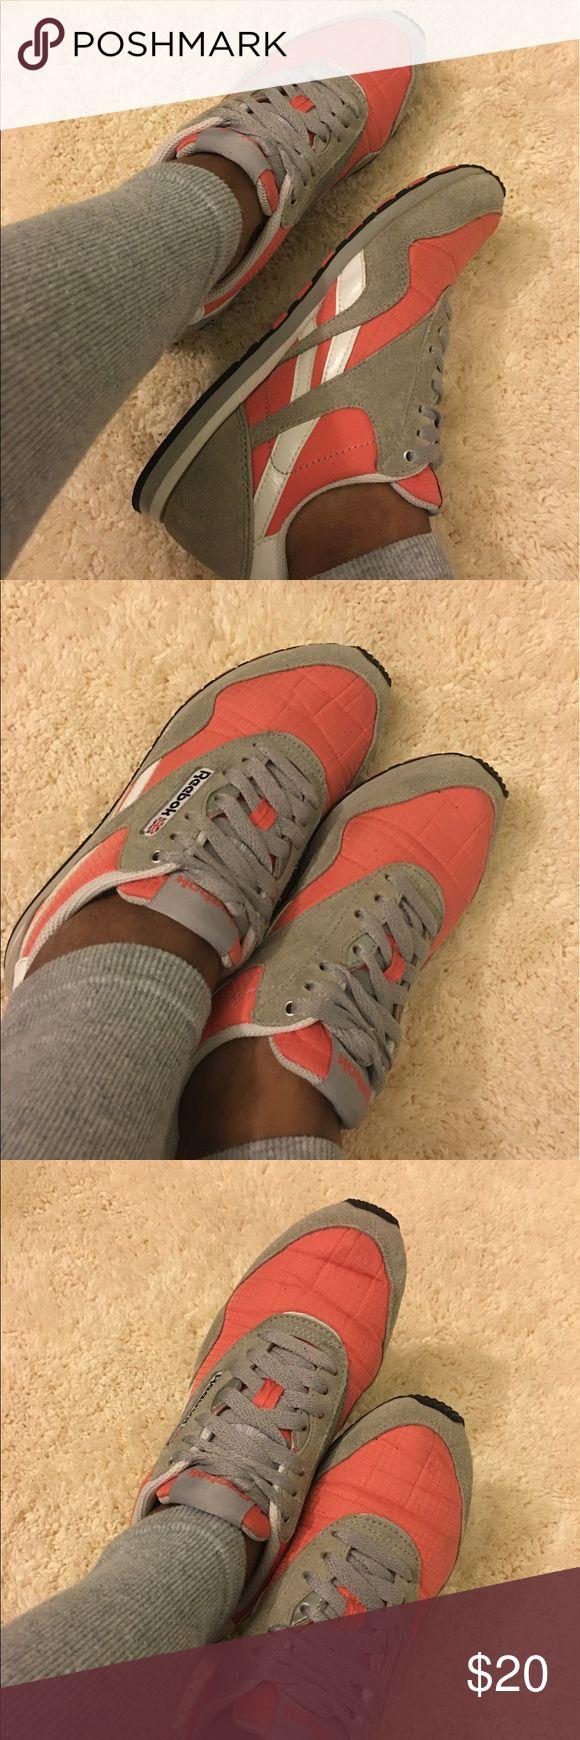 Reebok Skechers classic Good condition 😊 Reebok Shoes Sneakers